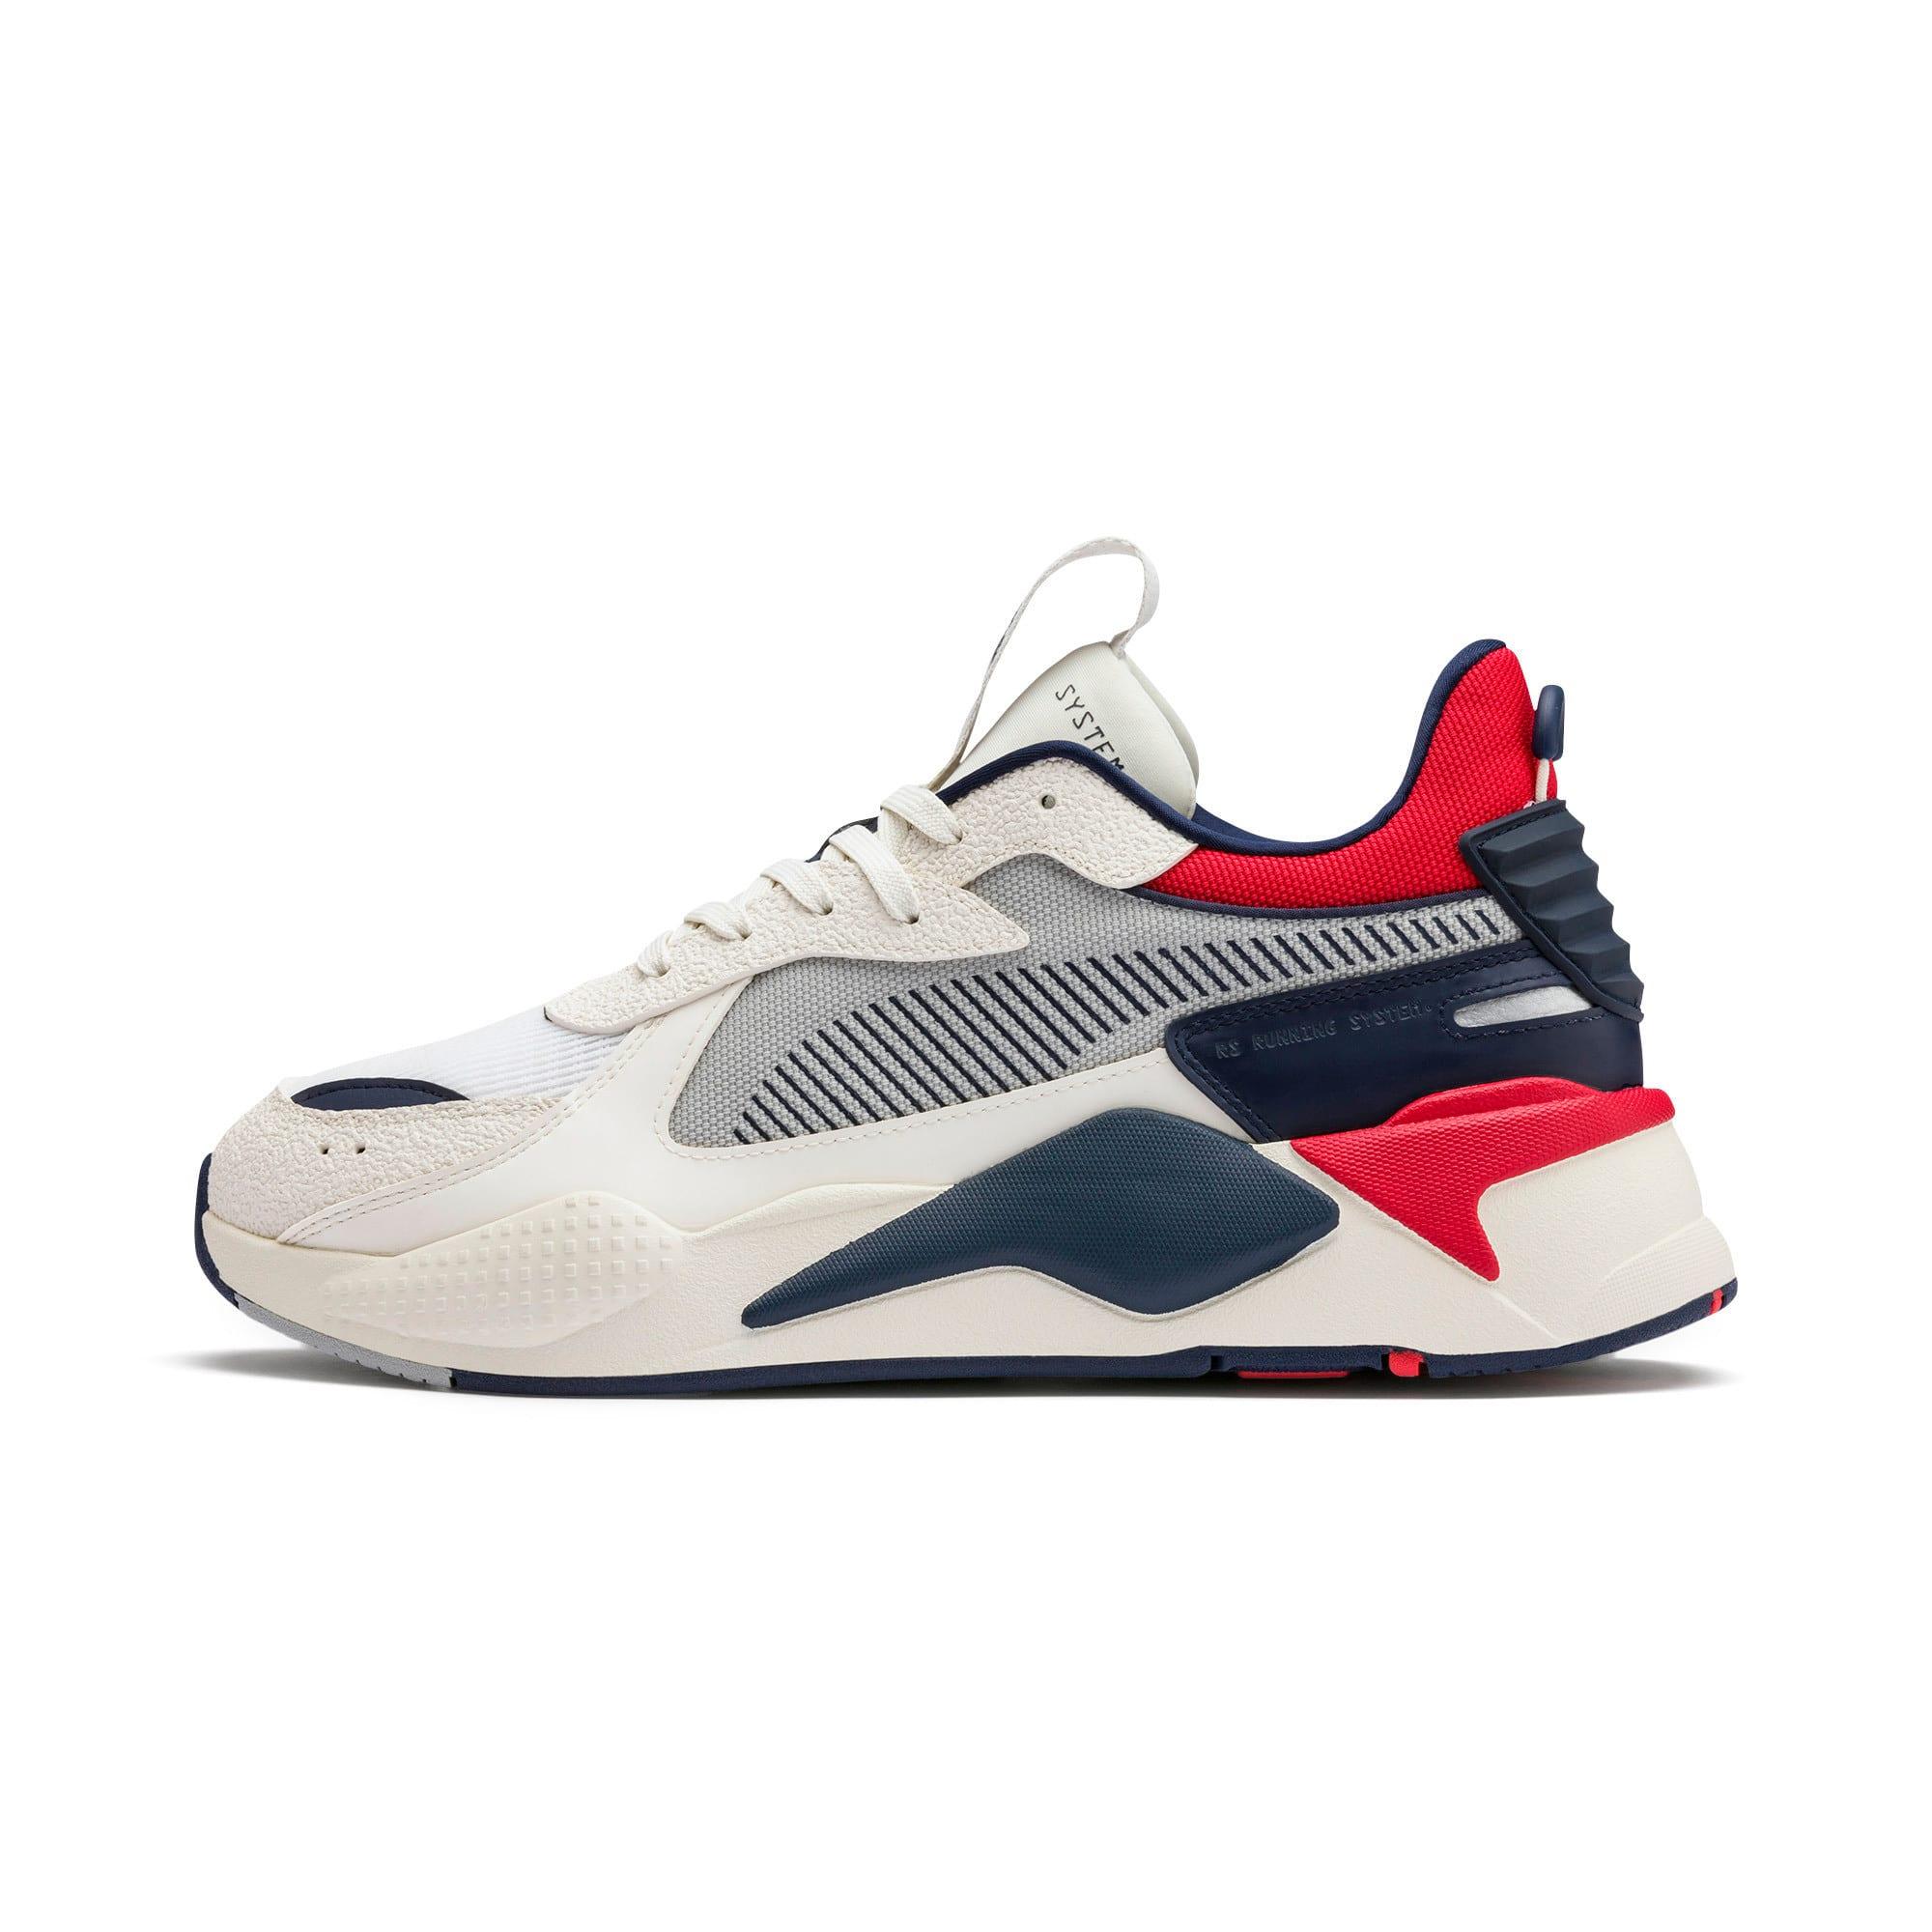 Thumbnail 1 of RS-X Hard Drive Sneakers, Whisper White-Peacoat, medium